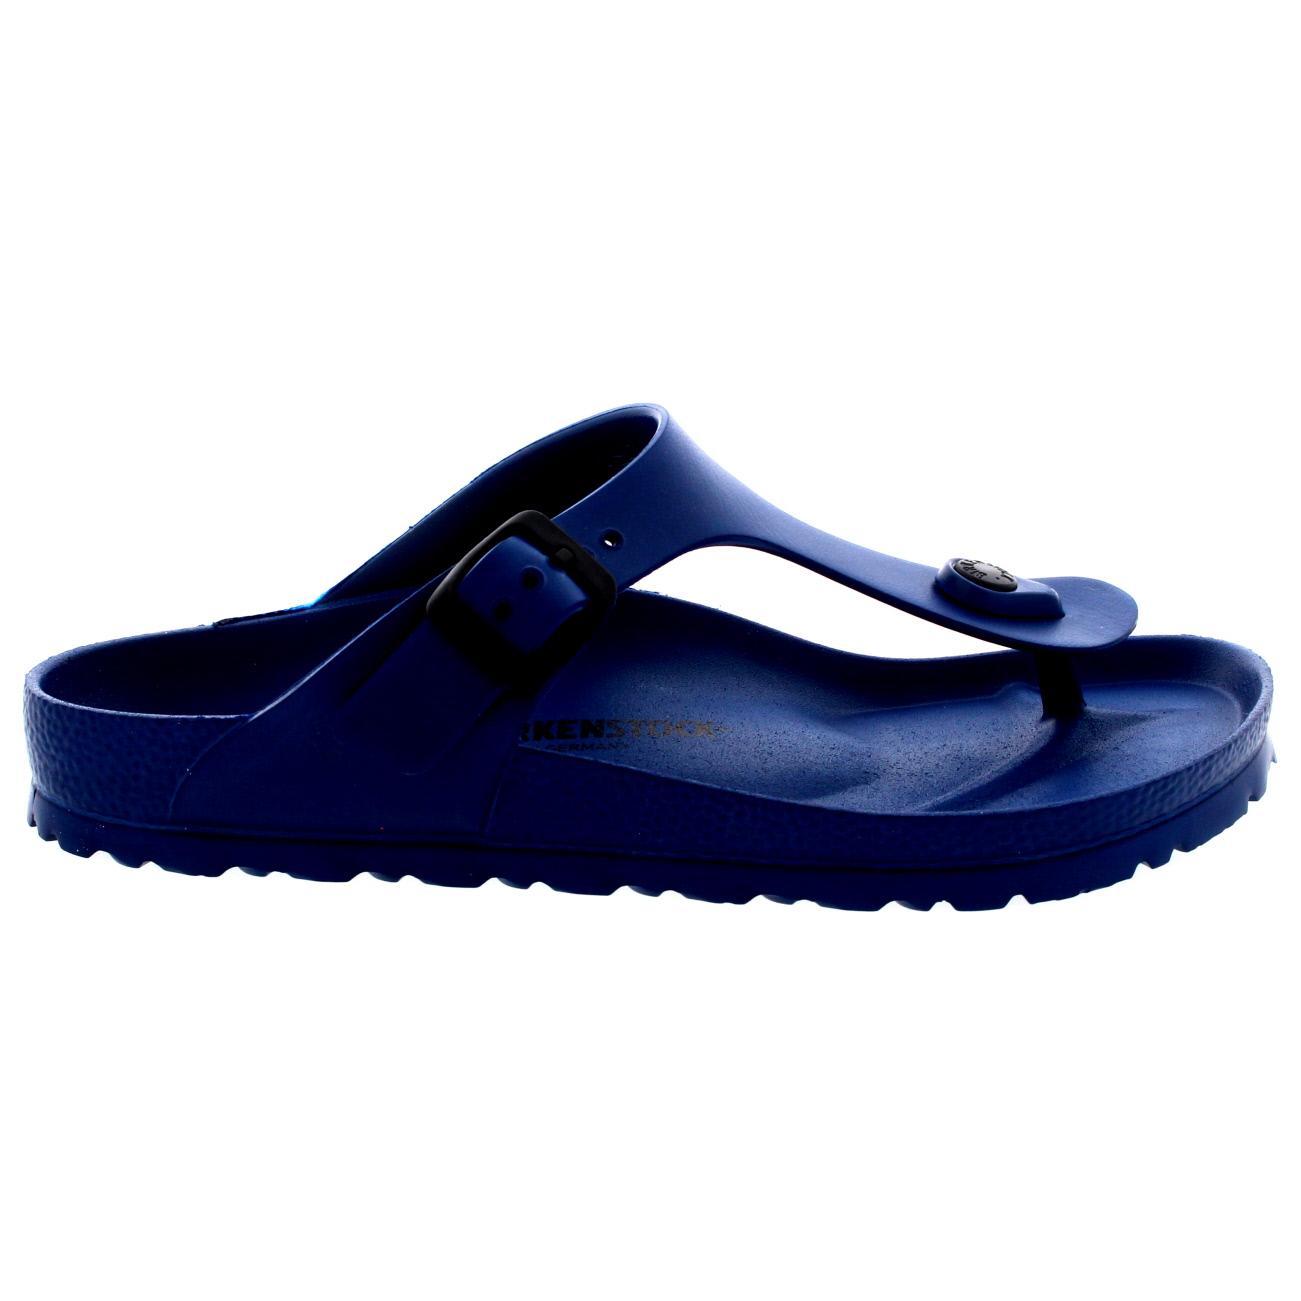 Unisex-Adults-Birkenstock-Gizeh-Summer-EVA-Toe-Post-Beach-Flat-Sandals-All-Sizes thumbnail 20